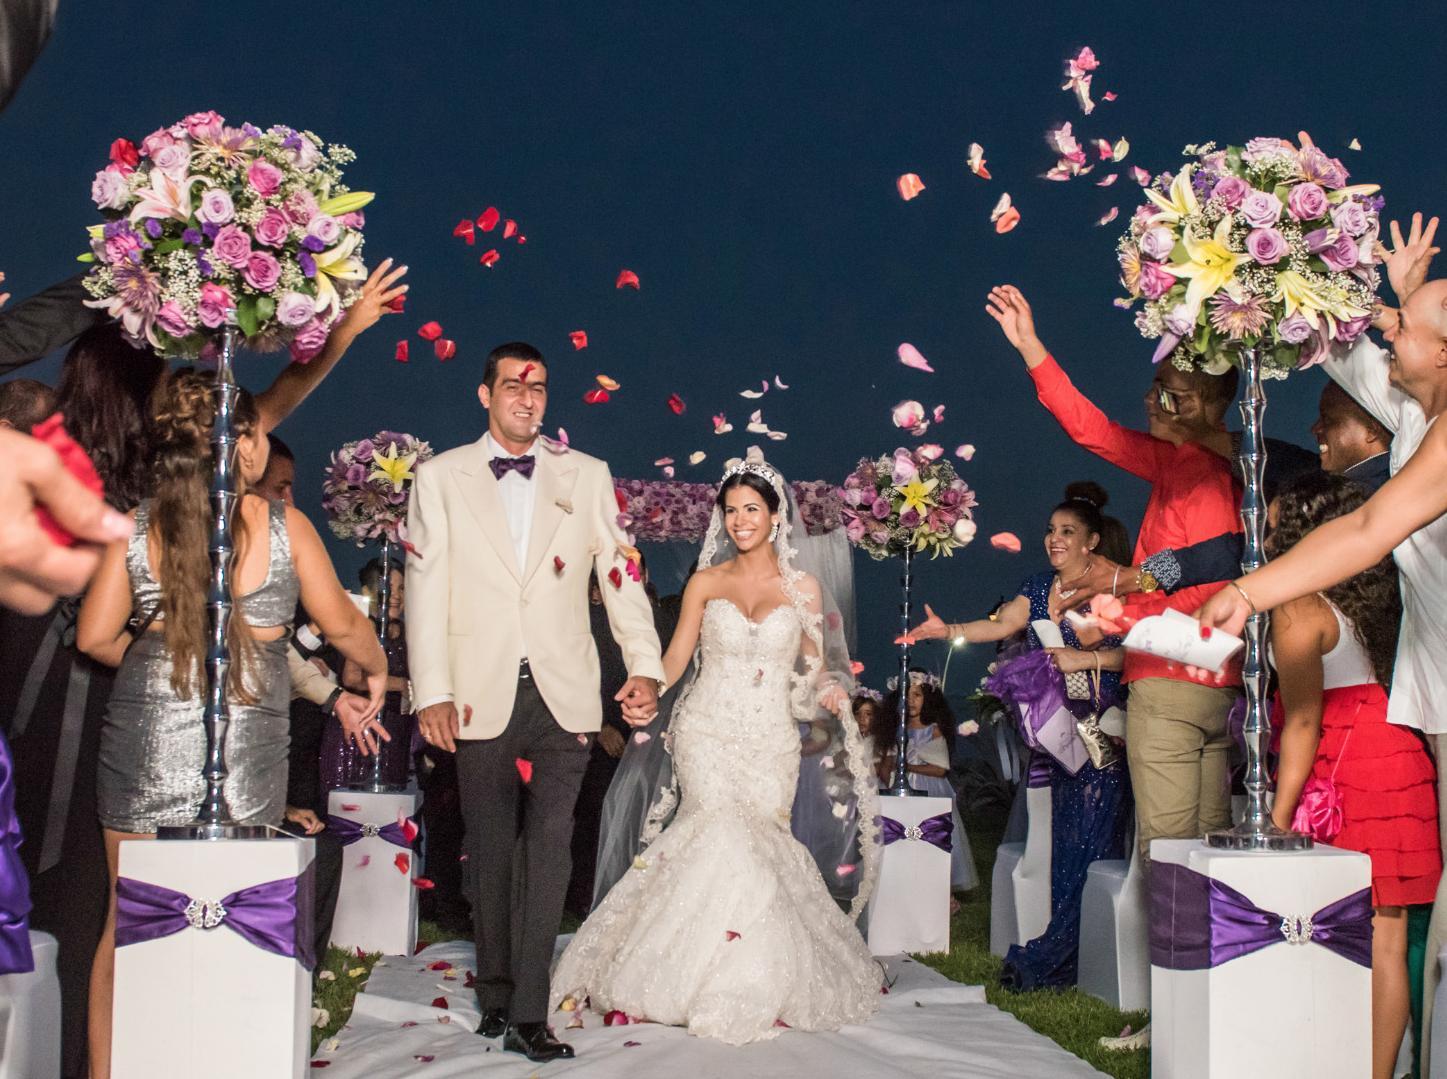 bodas-estilo-clasico-sin-tema-cuba-16591.jpg